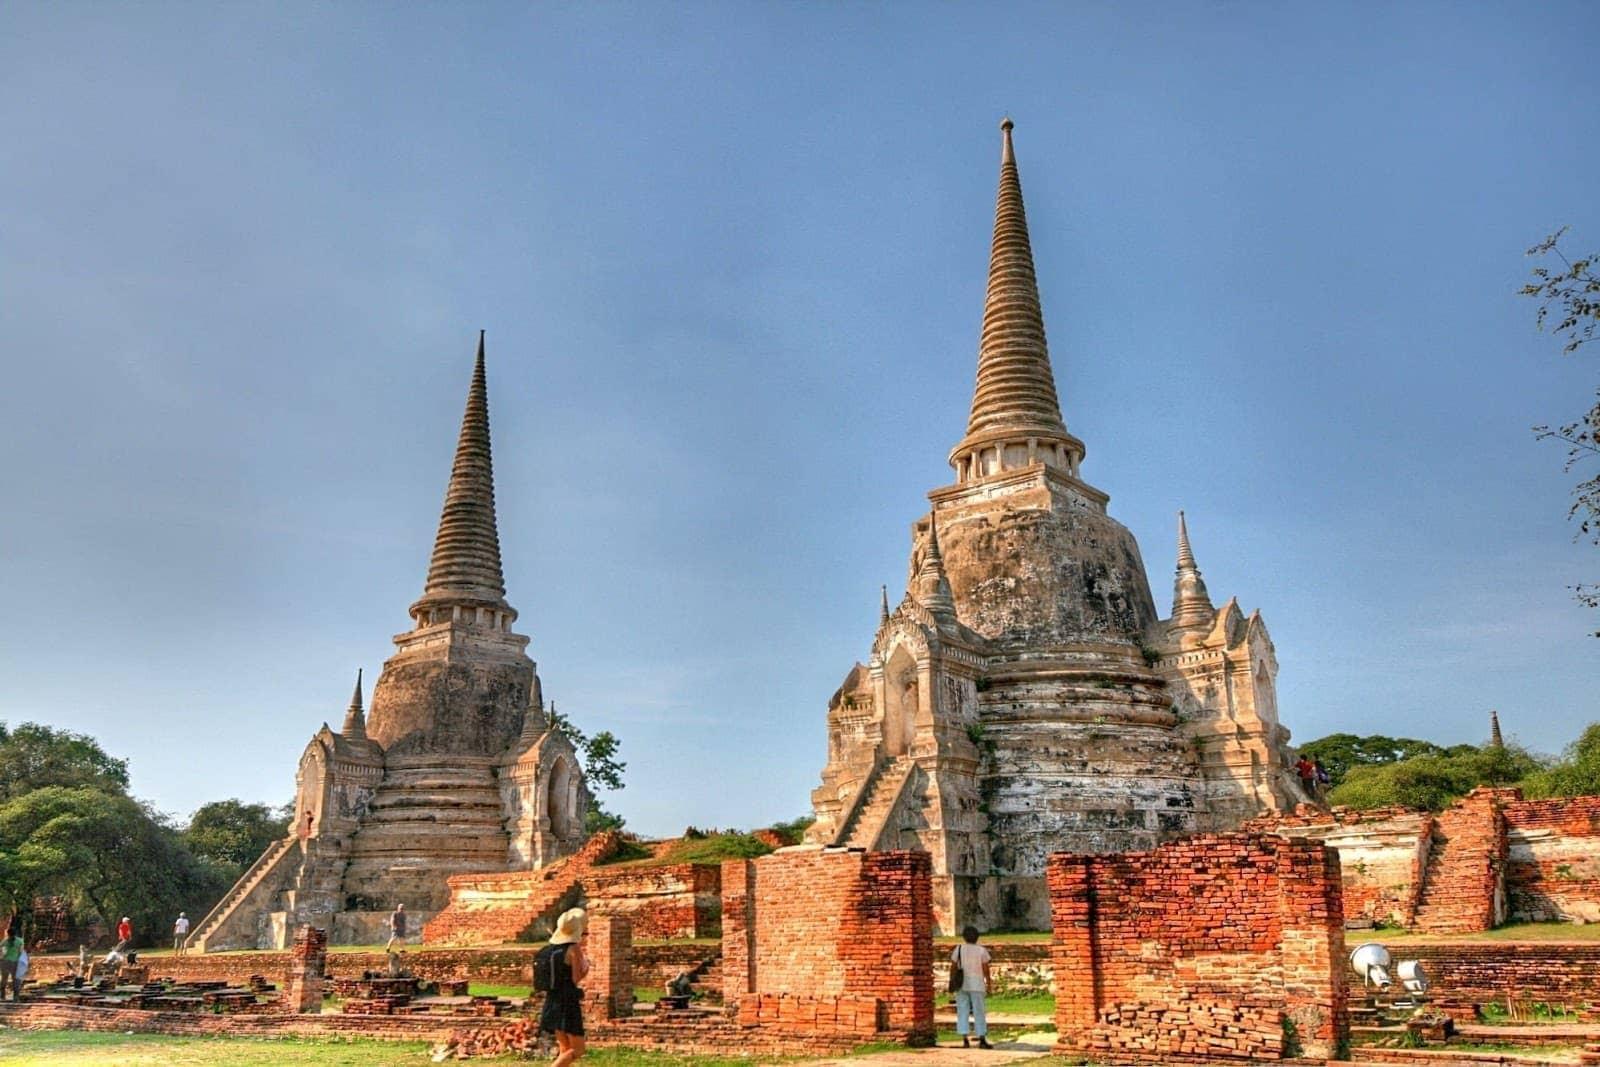 Wat Phra si Sanset The Grand Palace Ayutthaya Thailand